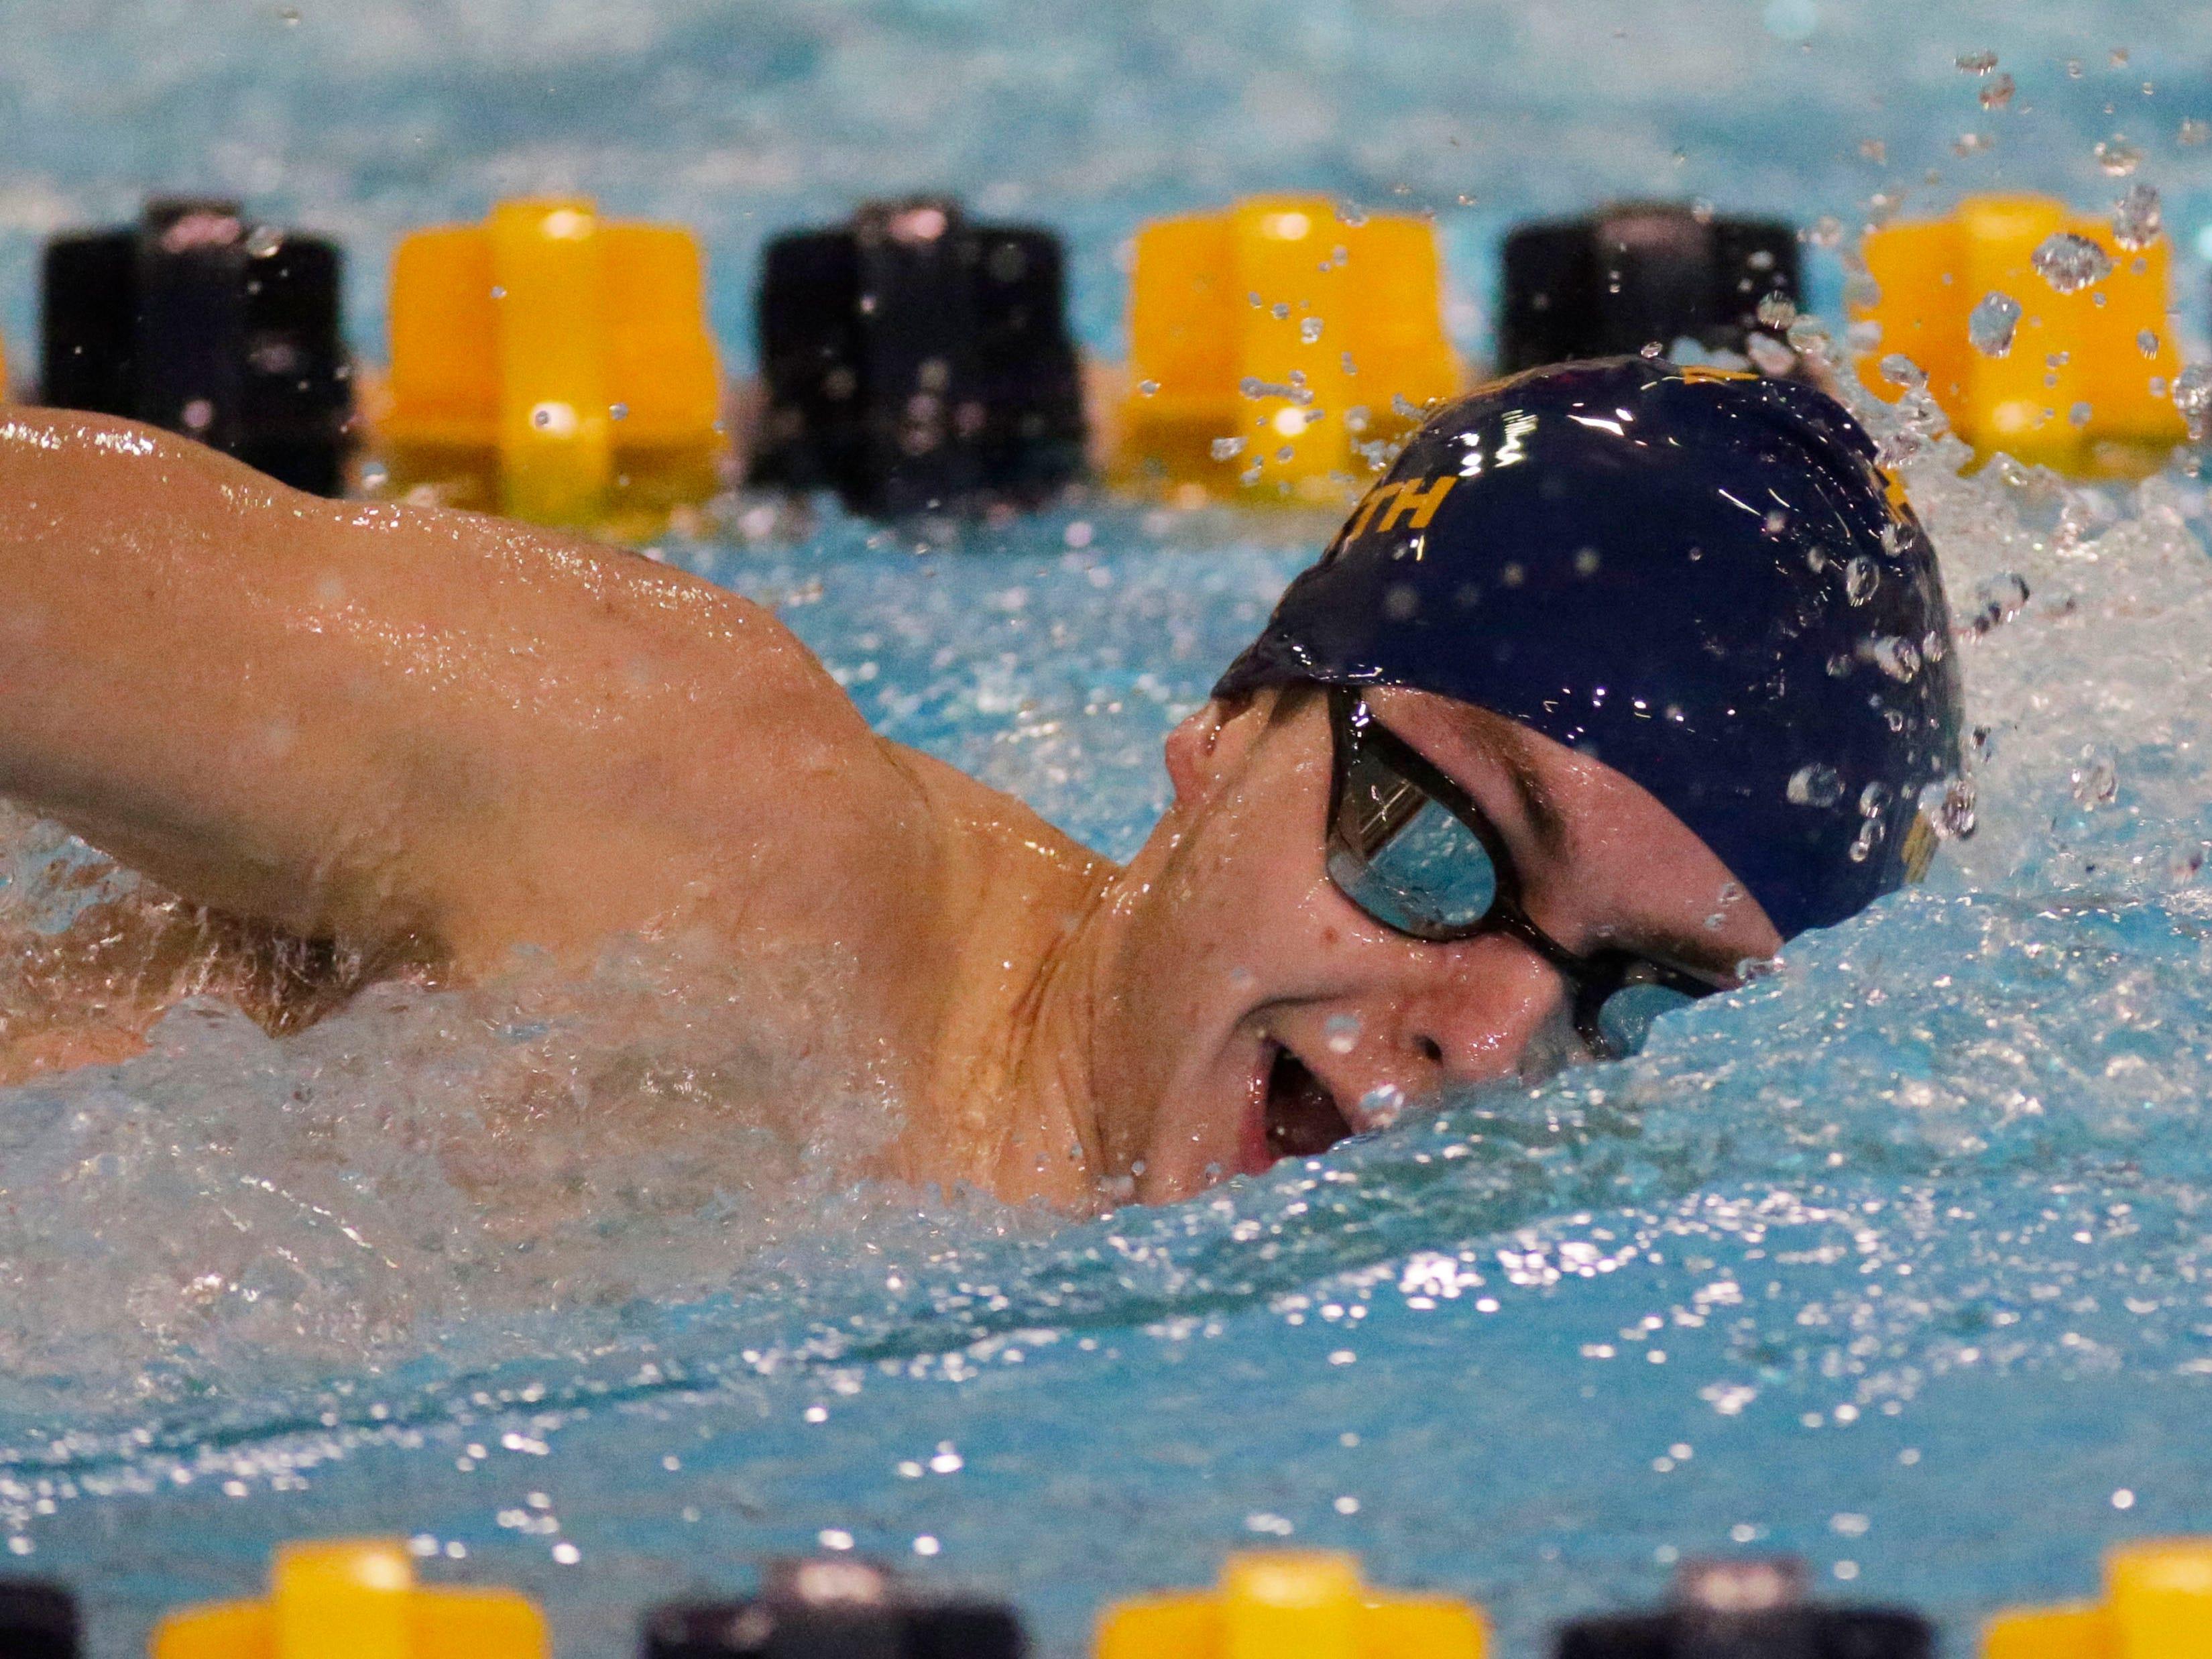 Sheboygan North's Charles Broghammer swims the 750 yard relays at the Sheboygan North Raider Relays, Saturday, January 5, 2019, in Sheboygan, Wis.